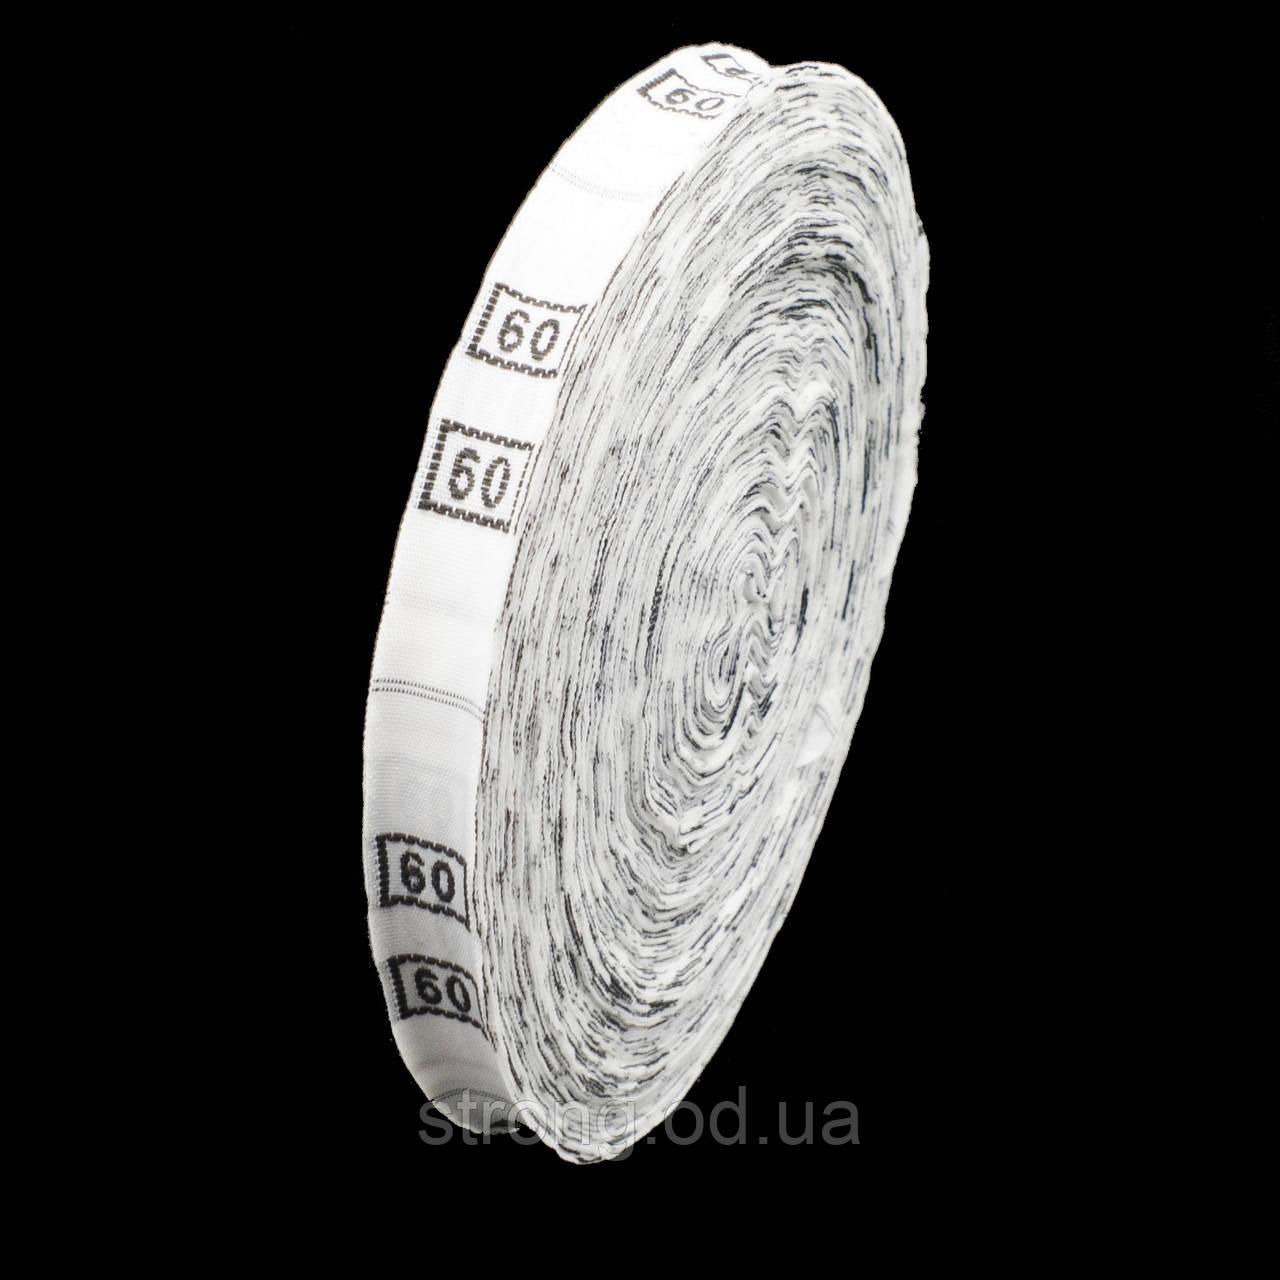 Размерник тканевый №42 960шт. Белый